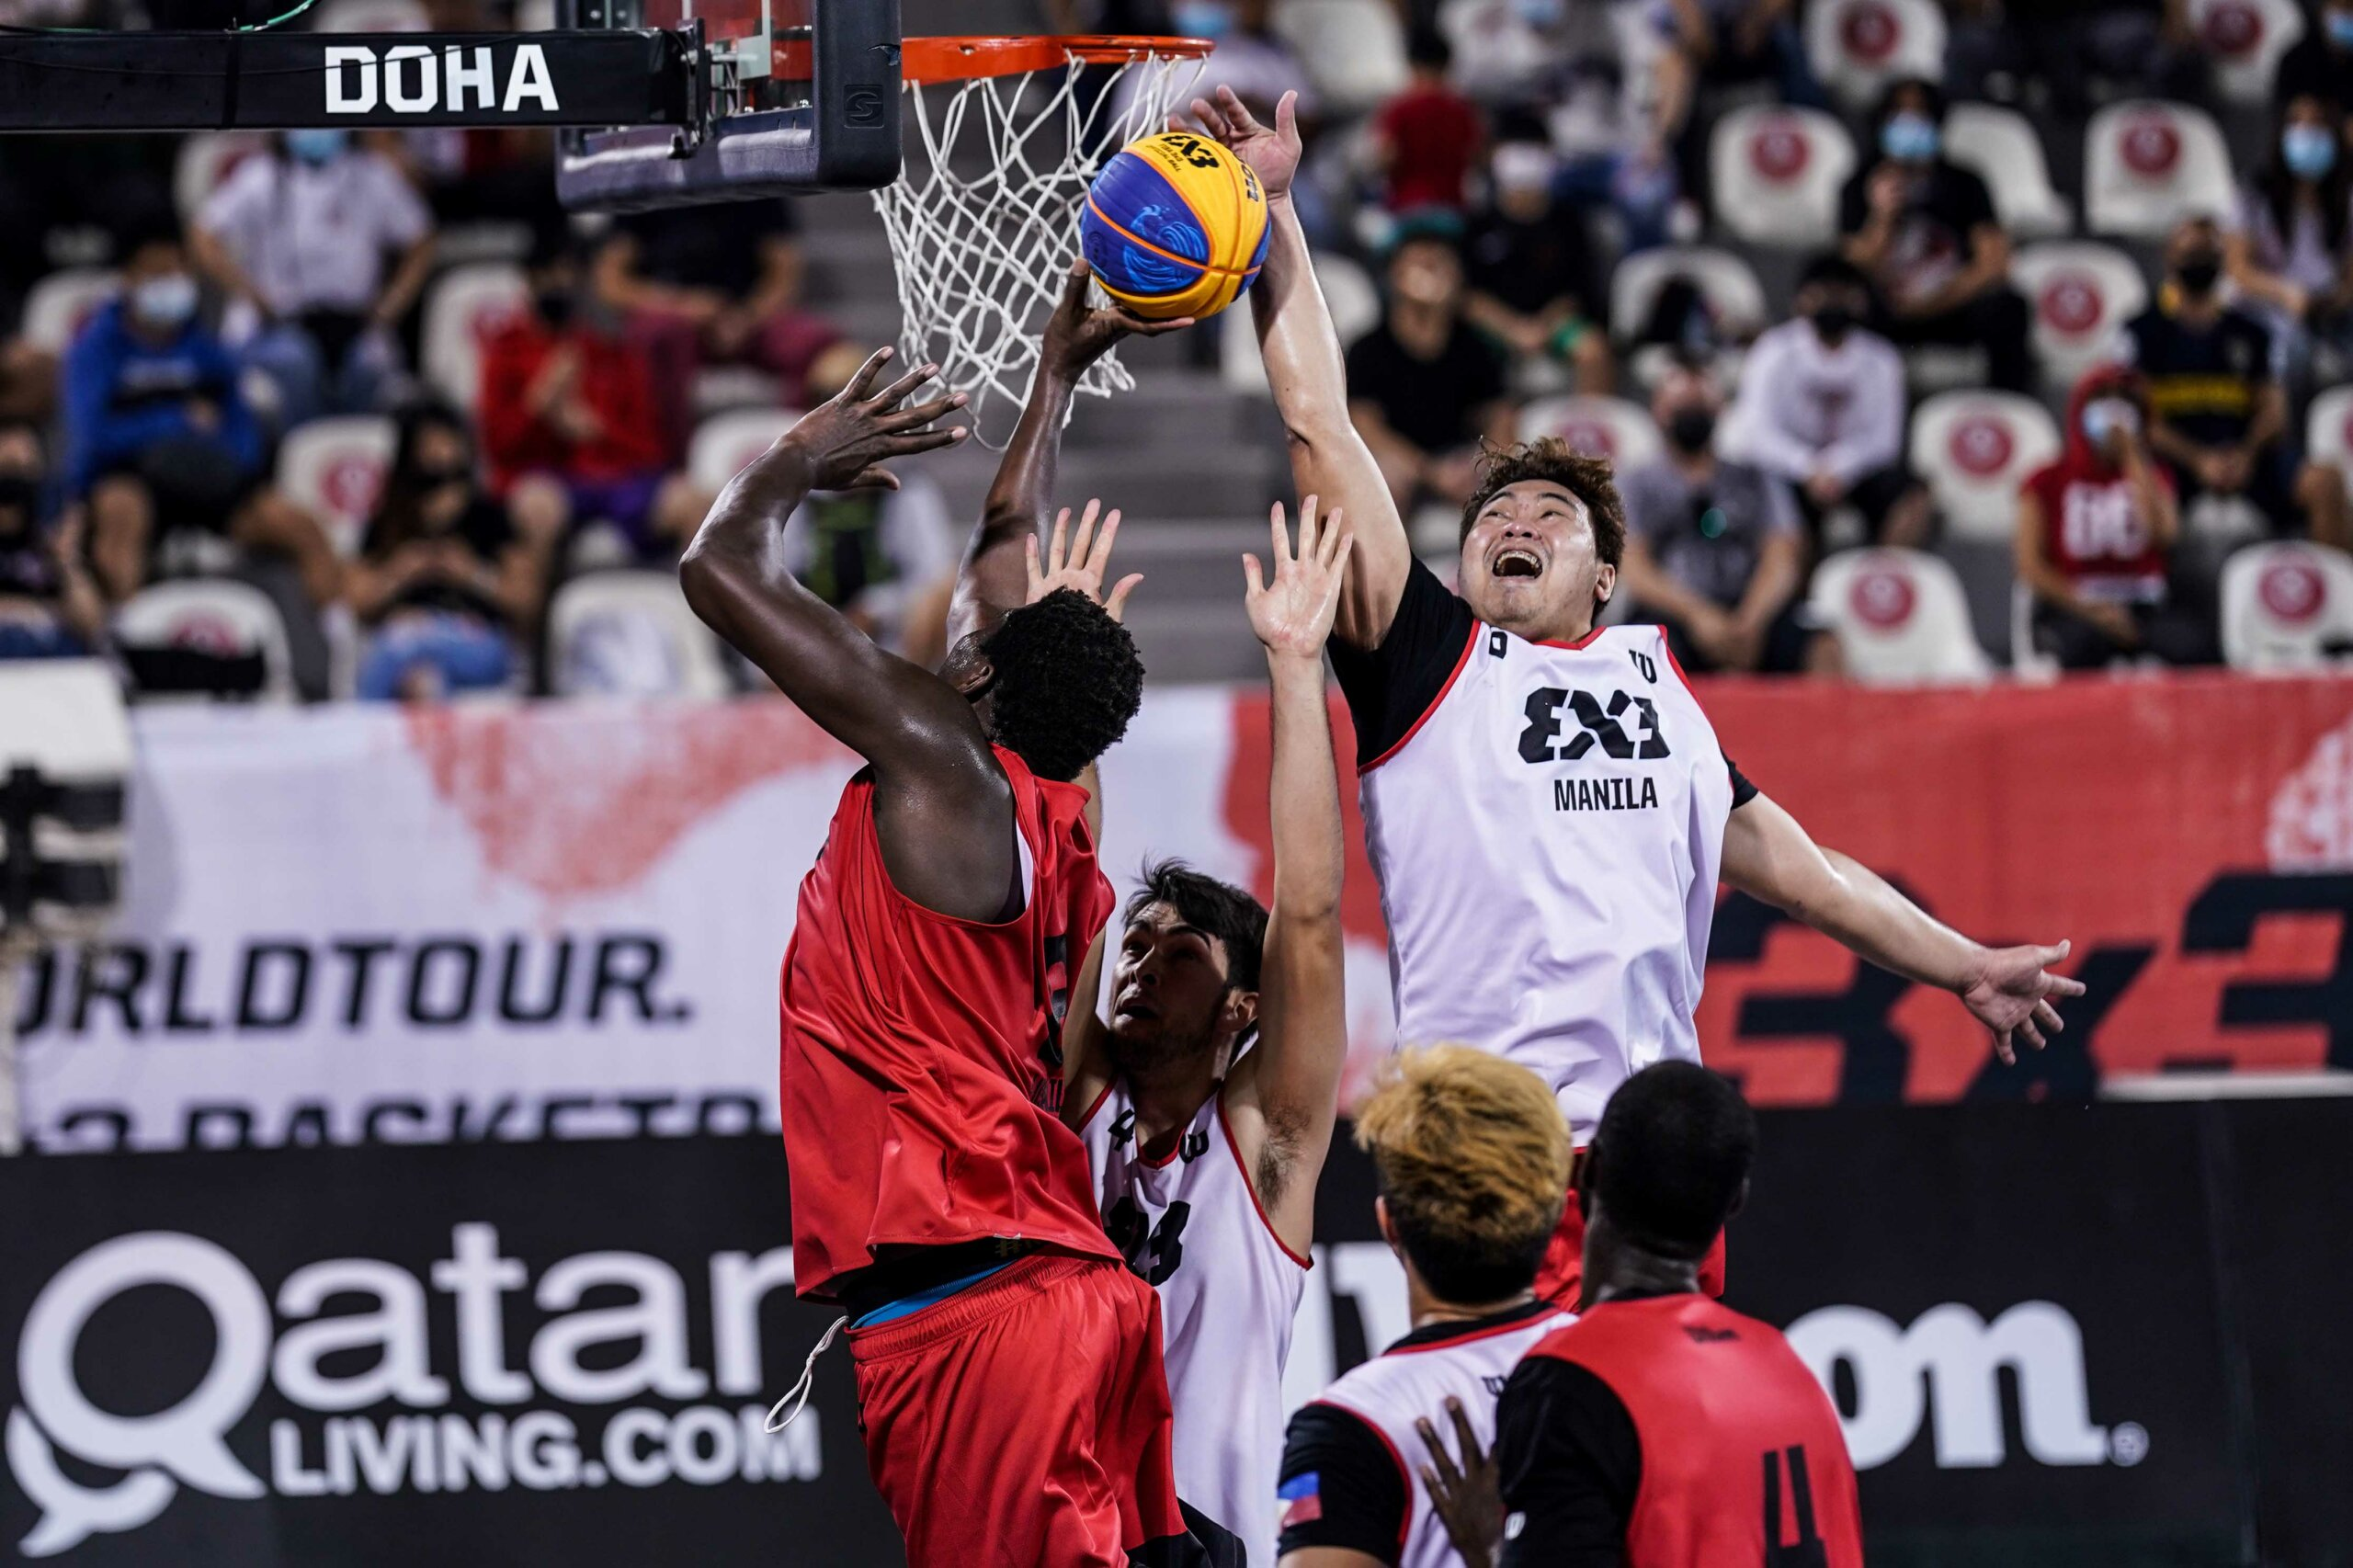 2020-FIBA-3X3-DOHA-WT-Manila-Chooks-TM-vs-Lusail-Pasaol-vs-Ndour-scaled Munzon, Pasaol to bring past experience vs Qatar, France to Gilas 3x3 3x3 Basketball Gilas Pilipinas News  - philippine sports news